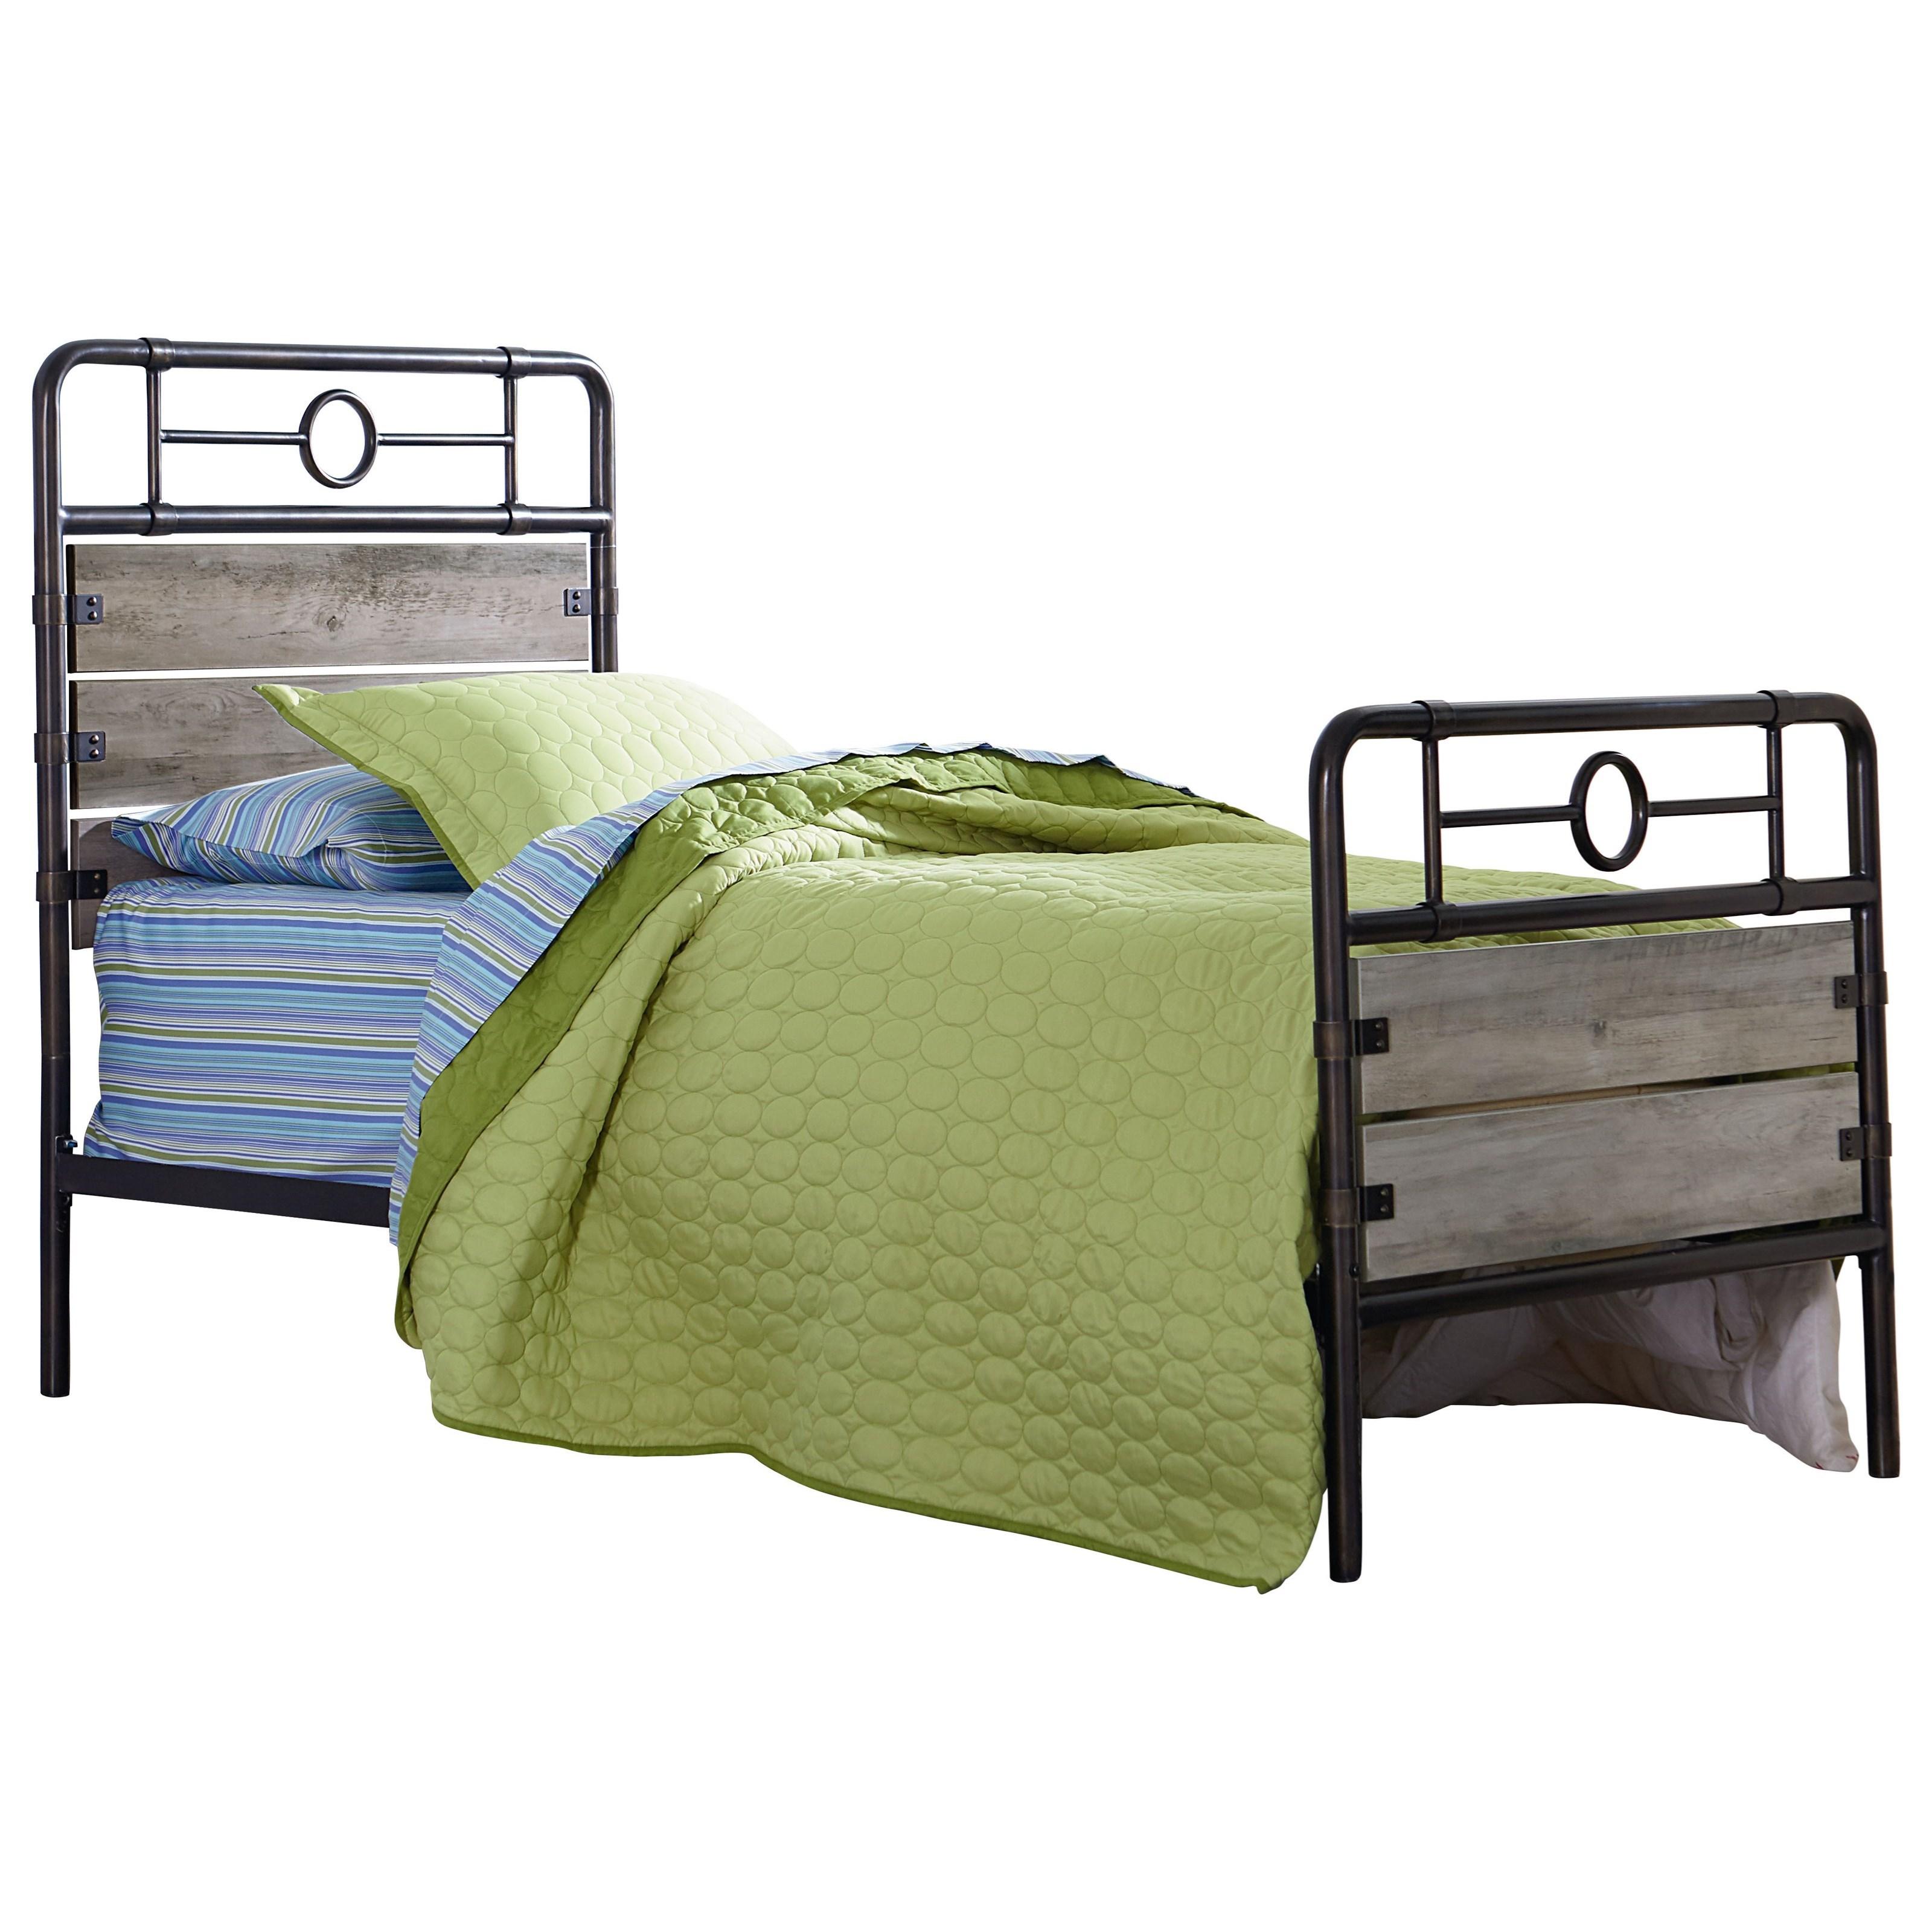 Standard Furniture Barnett Twin Bed - Item Number: 62403+62410